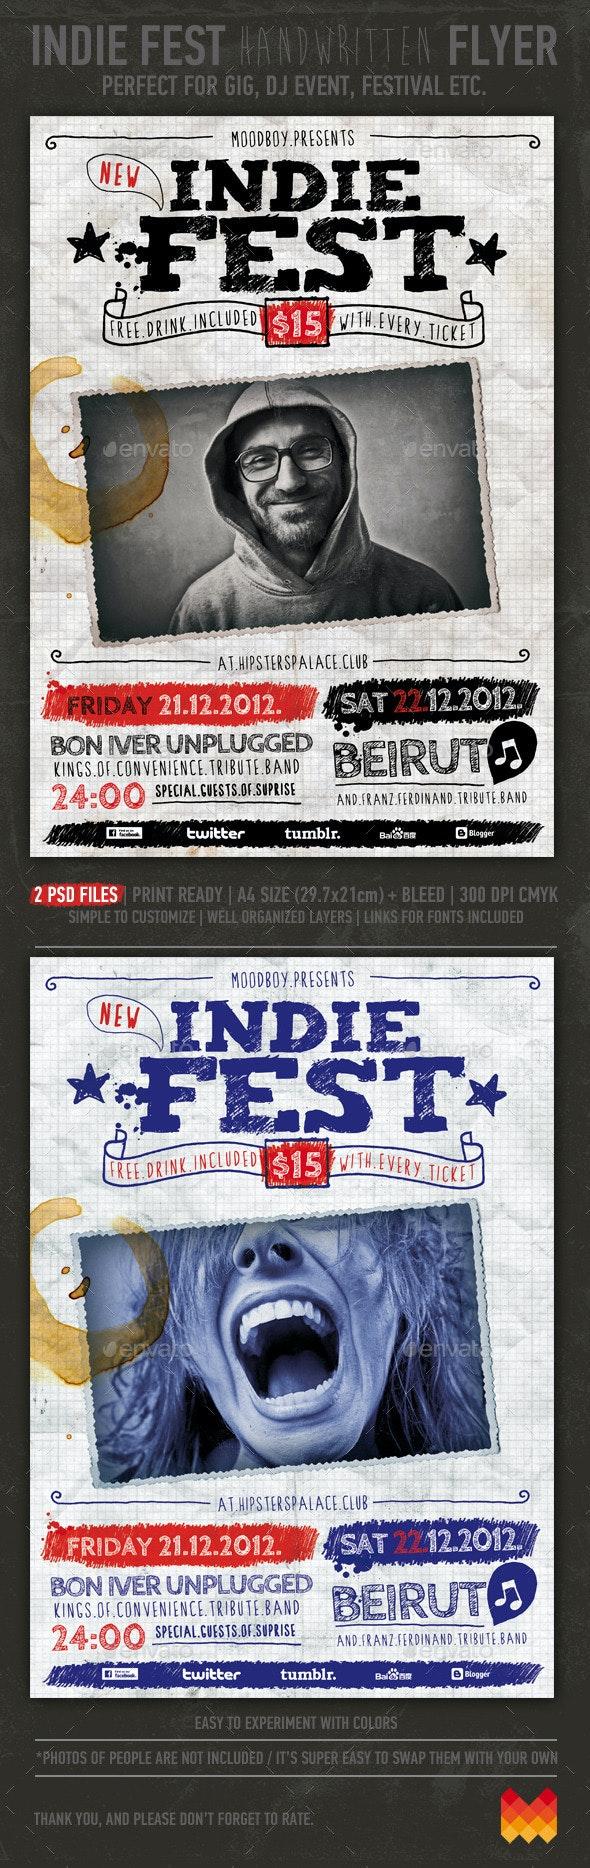 Indie Fest Handwritten Flyer/Poster - Events Flyers